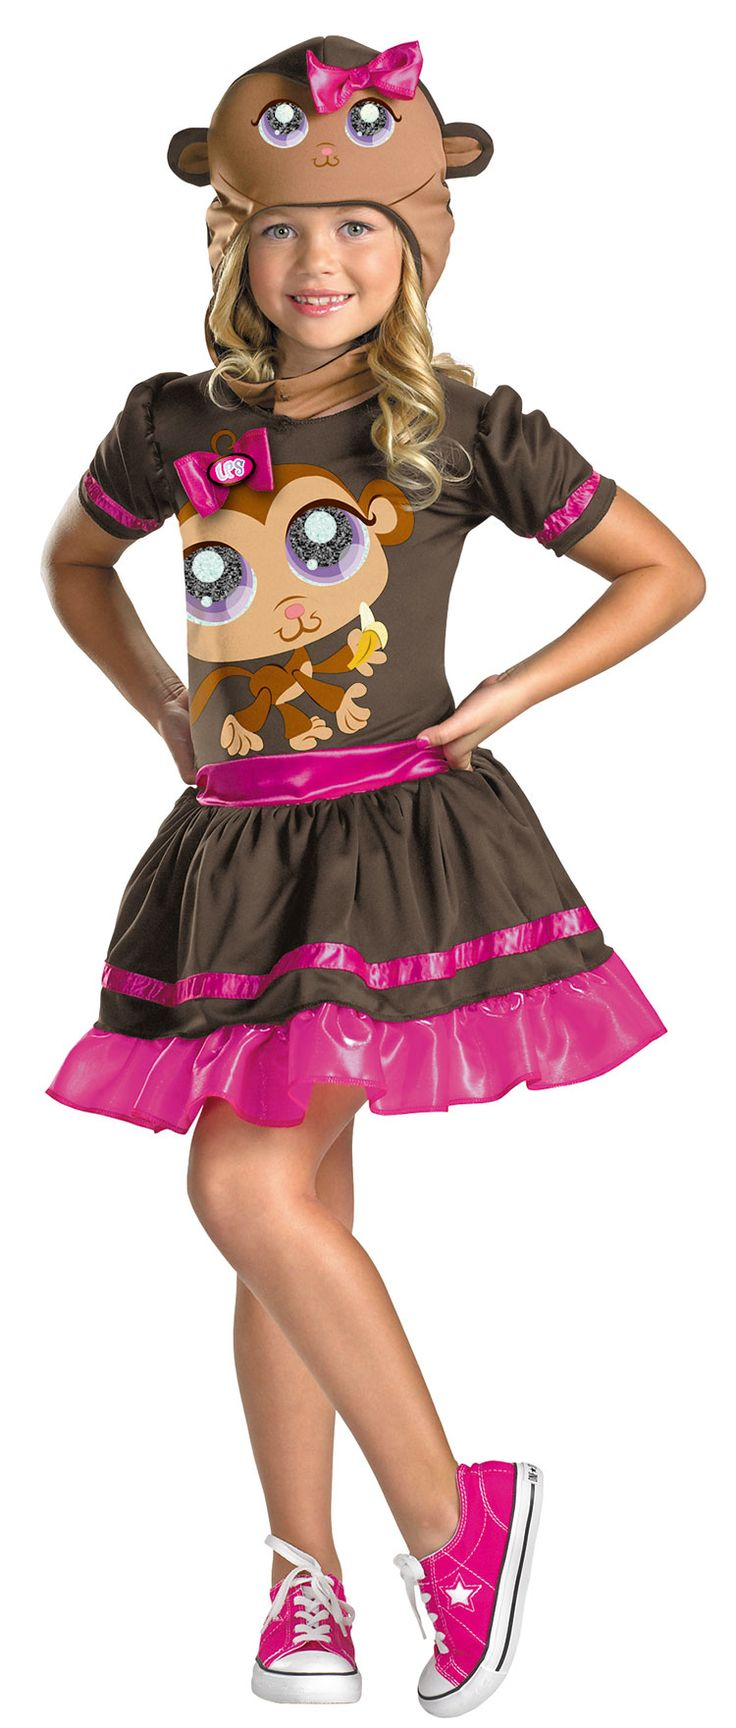 Littlest Pet Shop Monkey Kids Costume